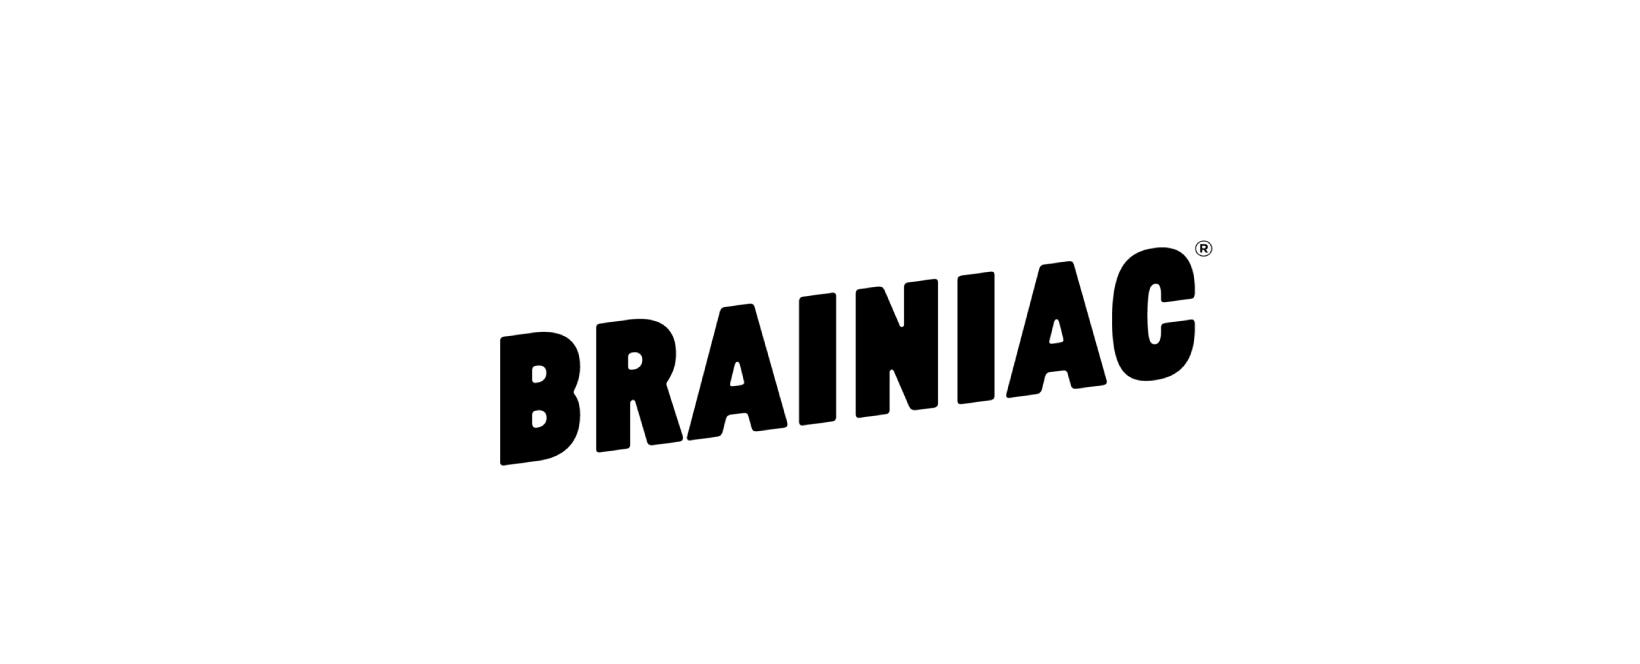 Brainiac Discount Code 2021